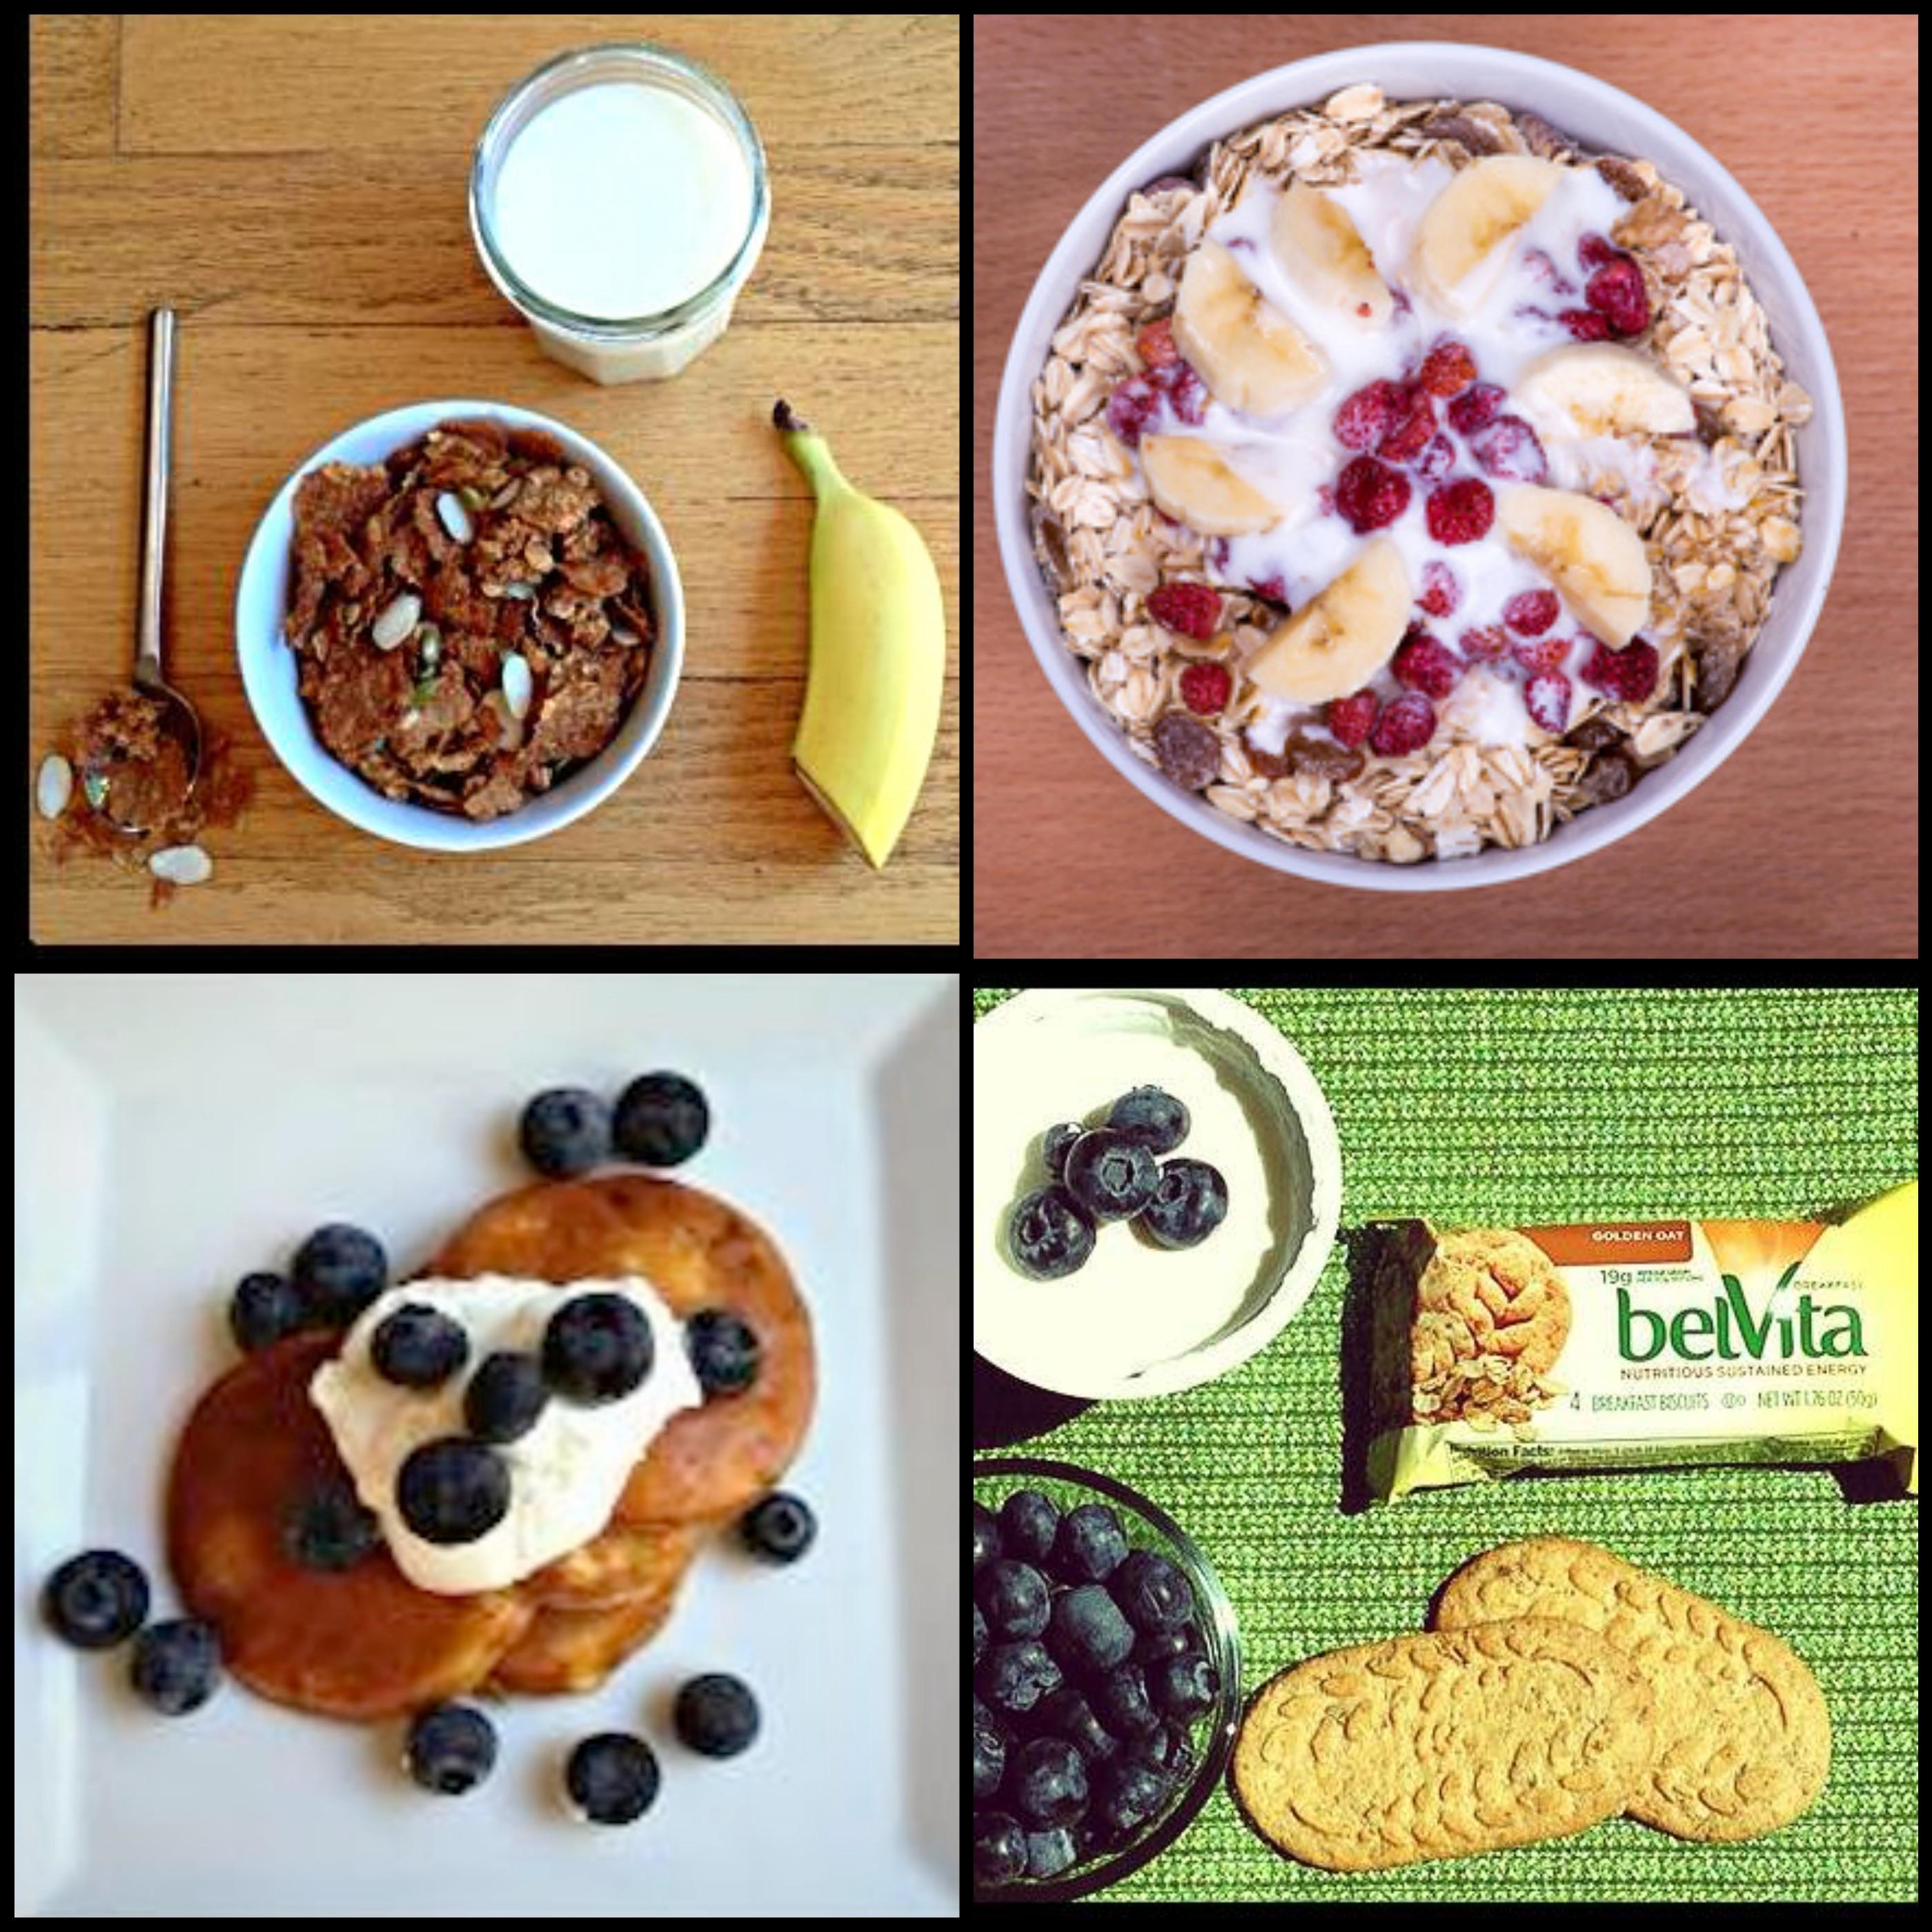 Healthy Protein Packed Breakfast  A Week s Worth of Protein Packed Breakfasts